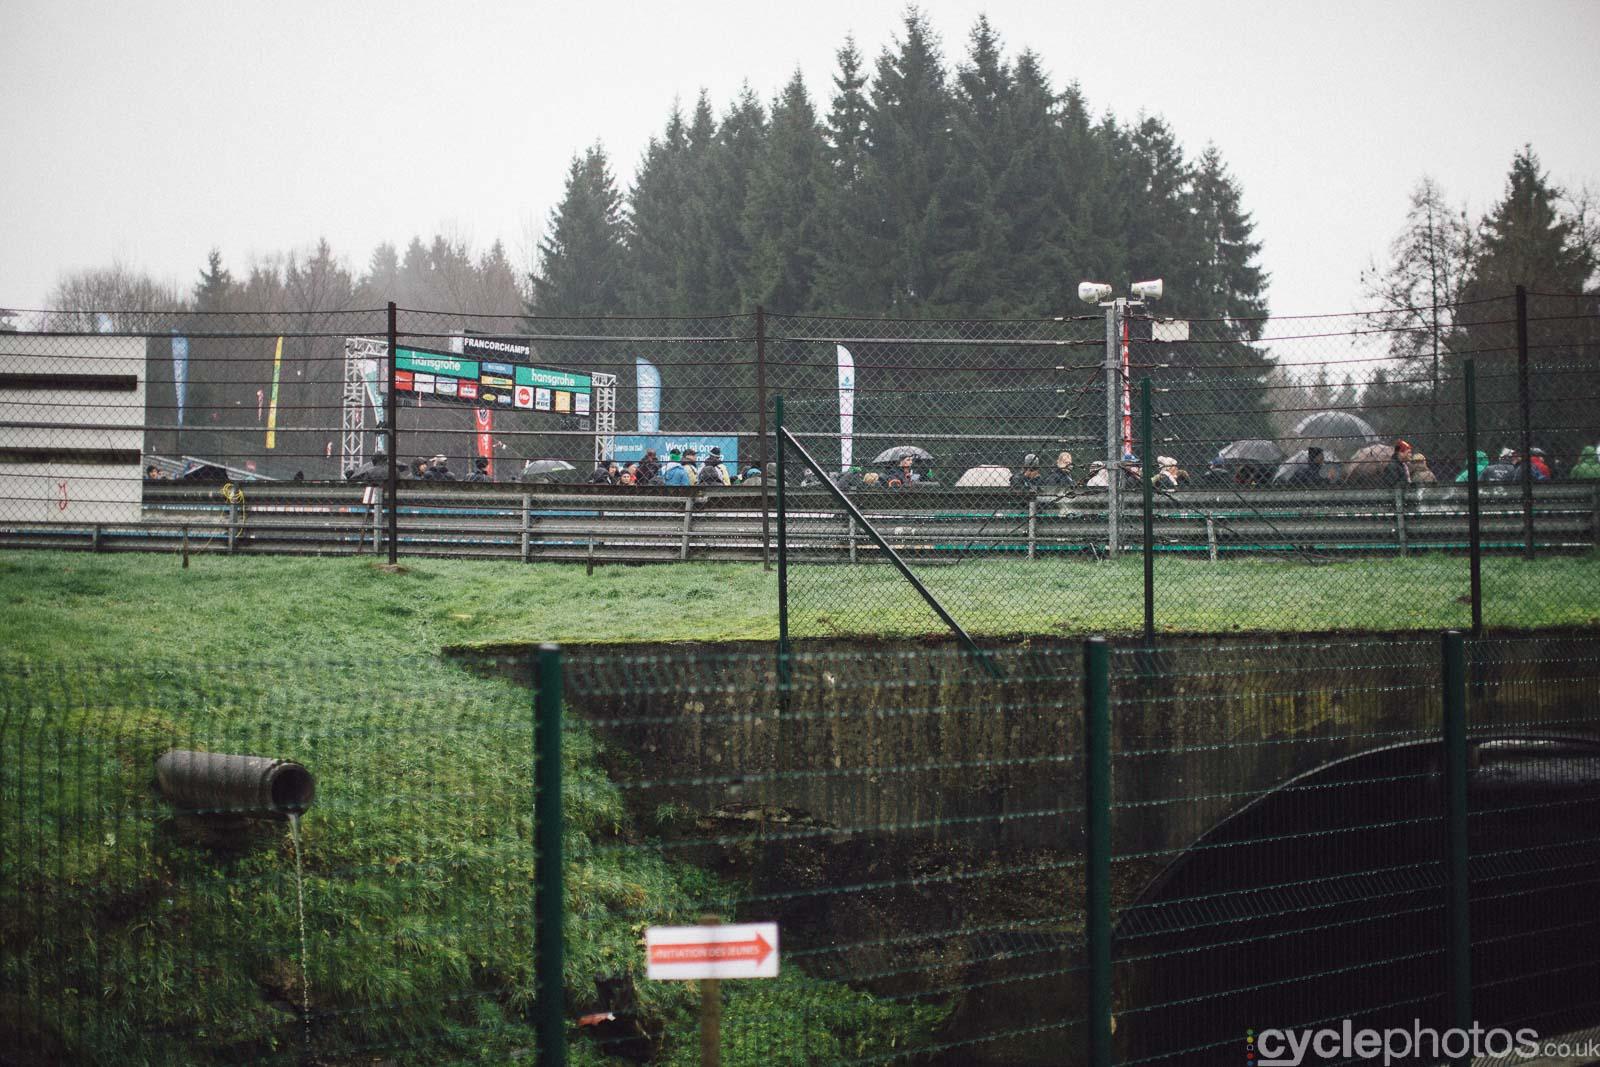 2015-cyclephotos-cyclocross-spa-144336-race